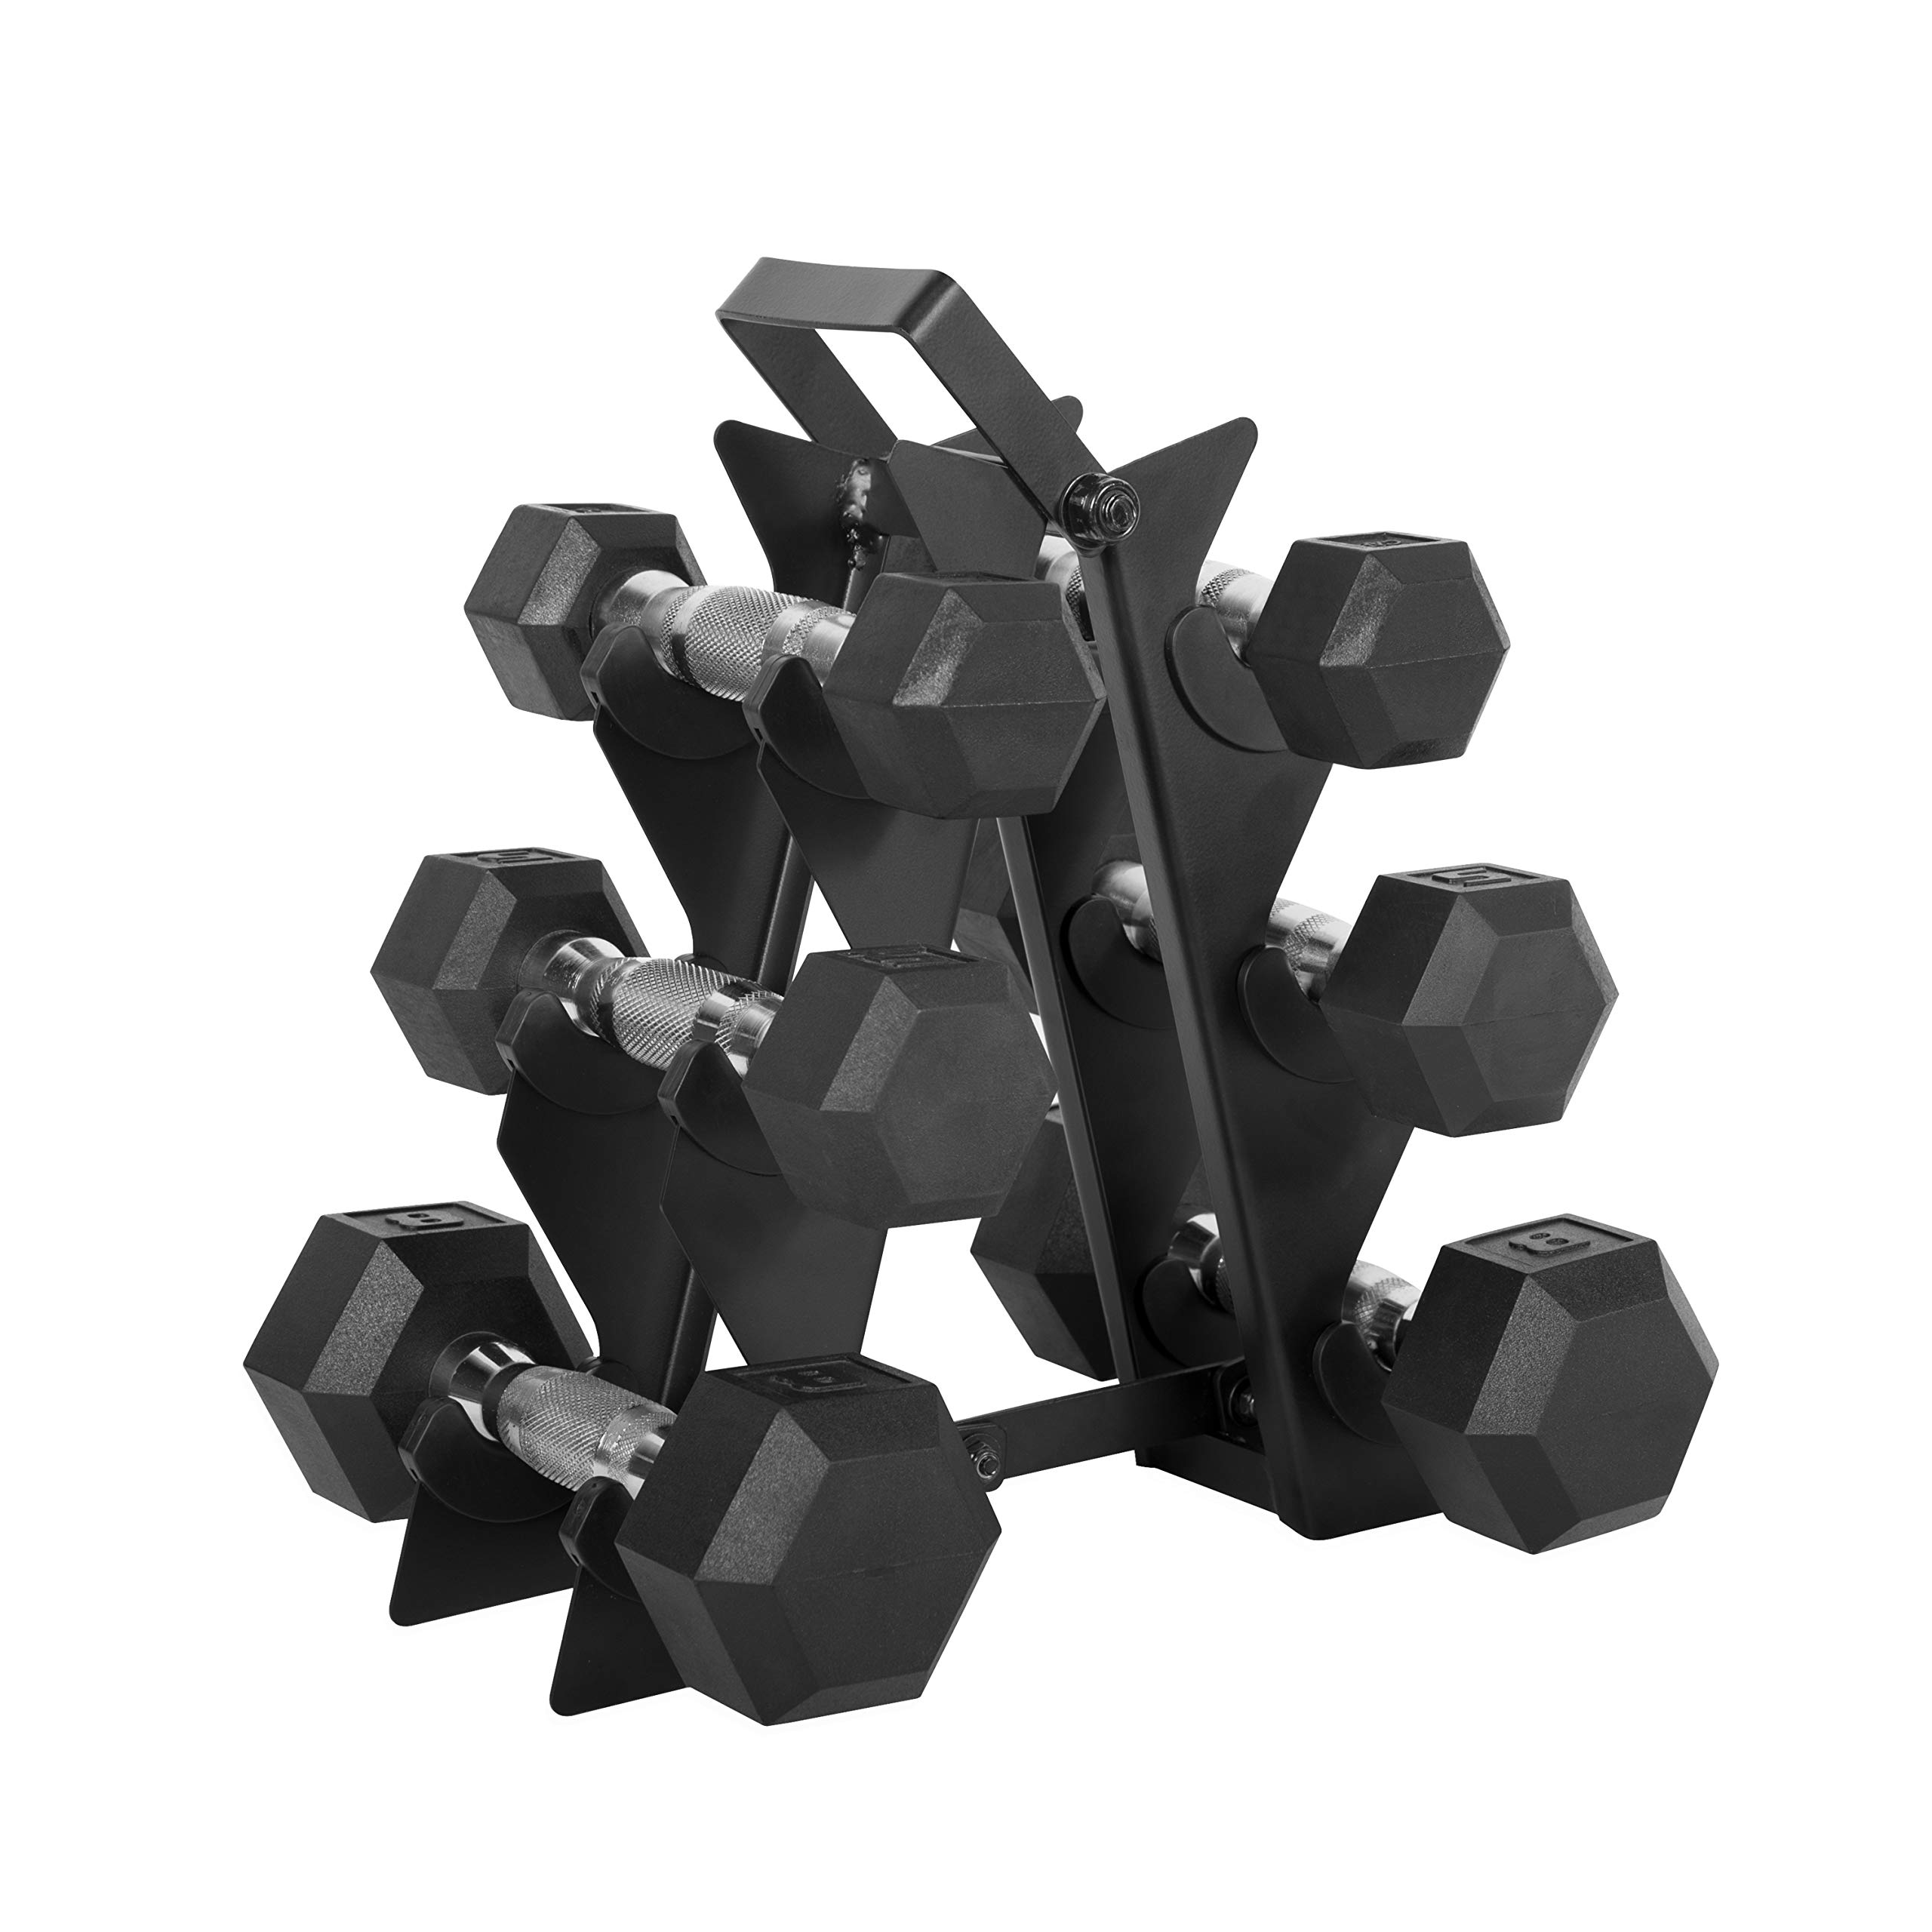 WF Athletic Supply Dumbbell Set with Storage Rack (32lb Rubber Coated Dumbbell Set)